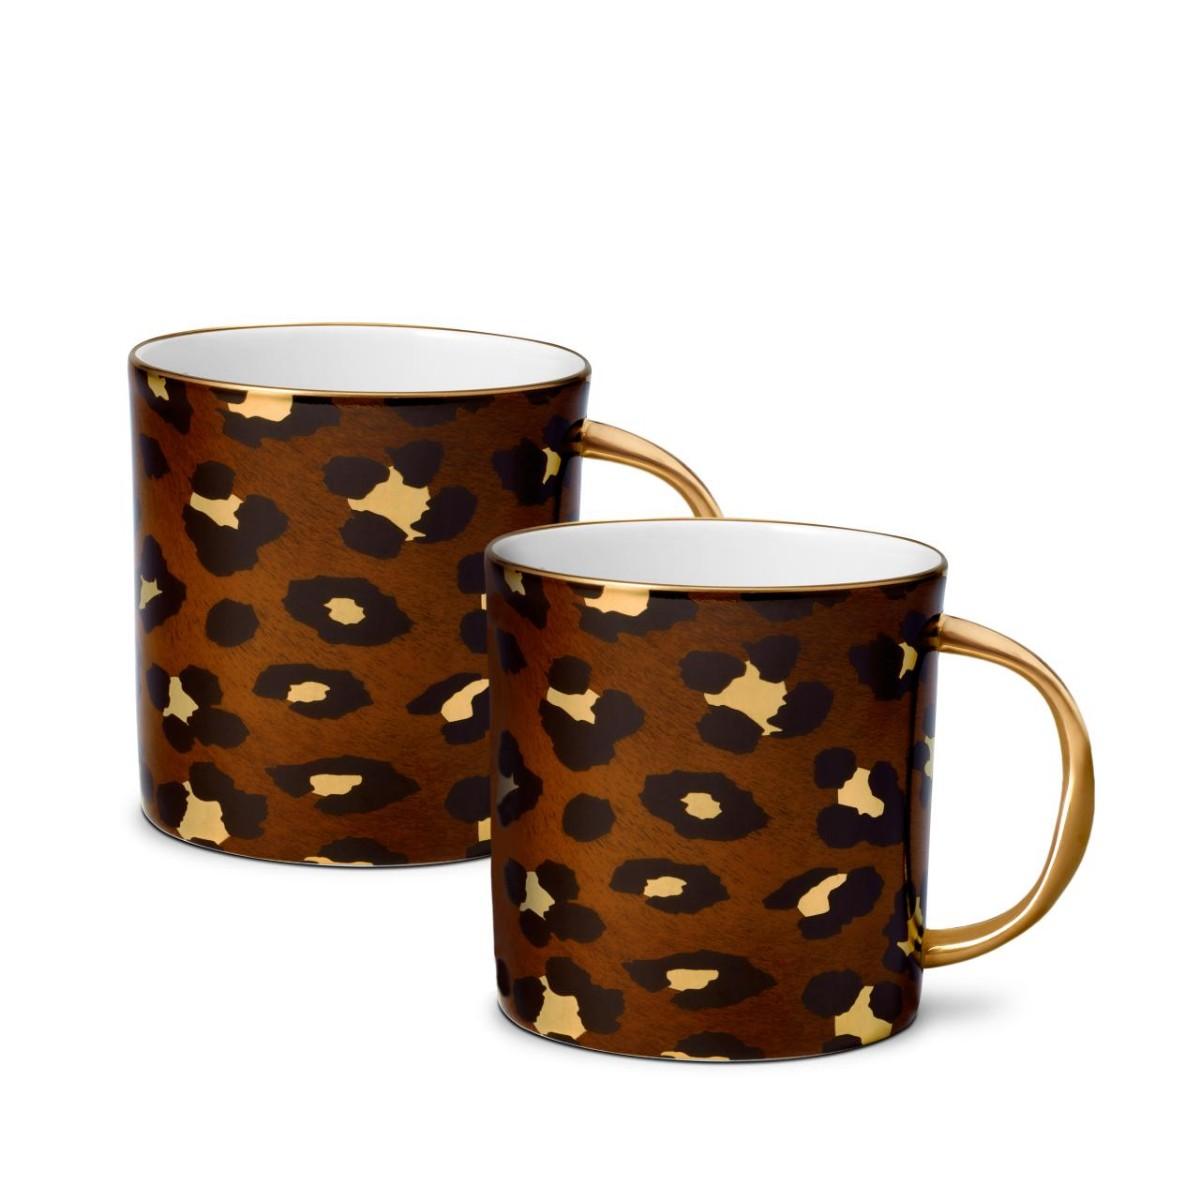 L'Objet I Leopard Mugs (Set of 2)